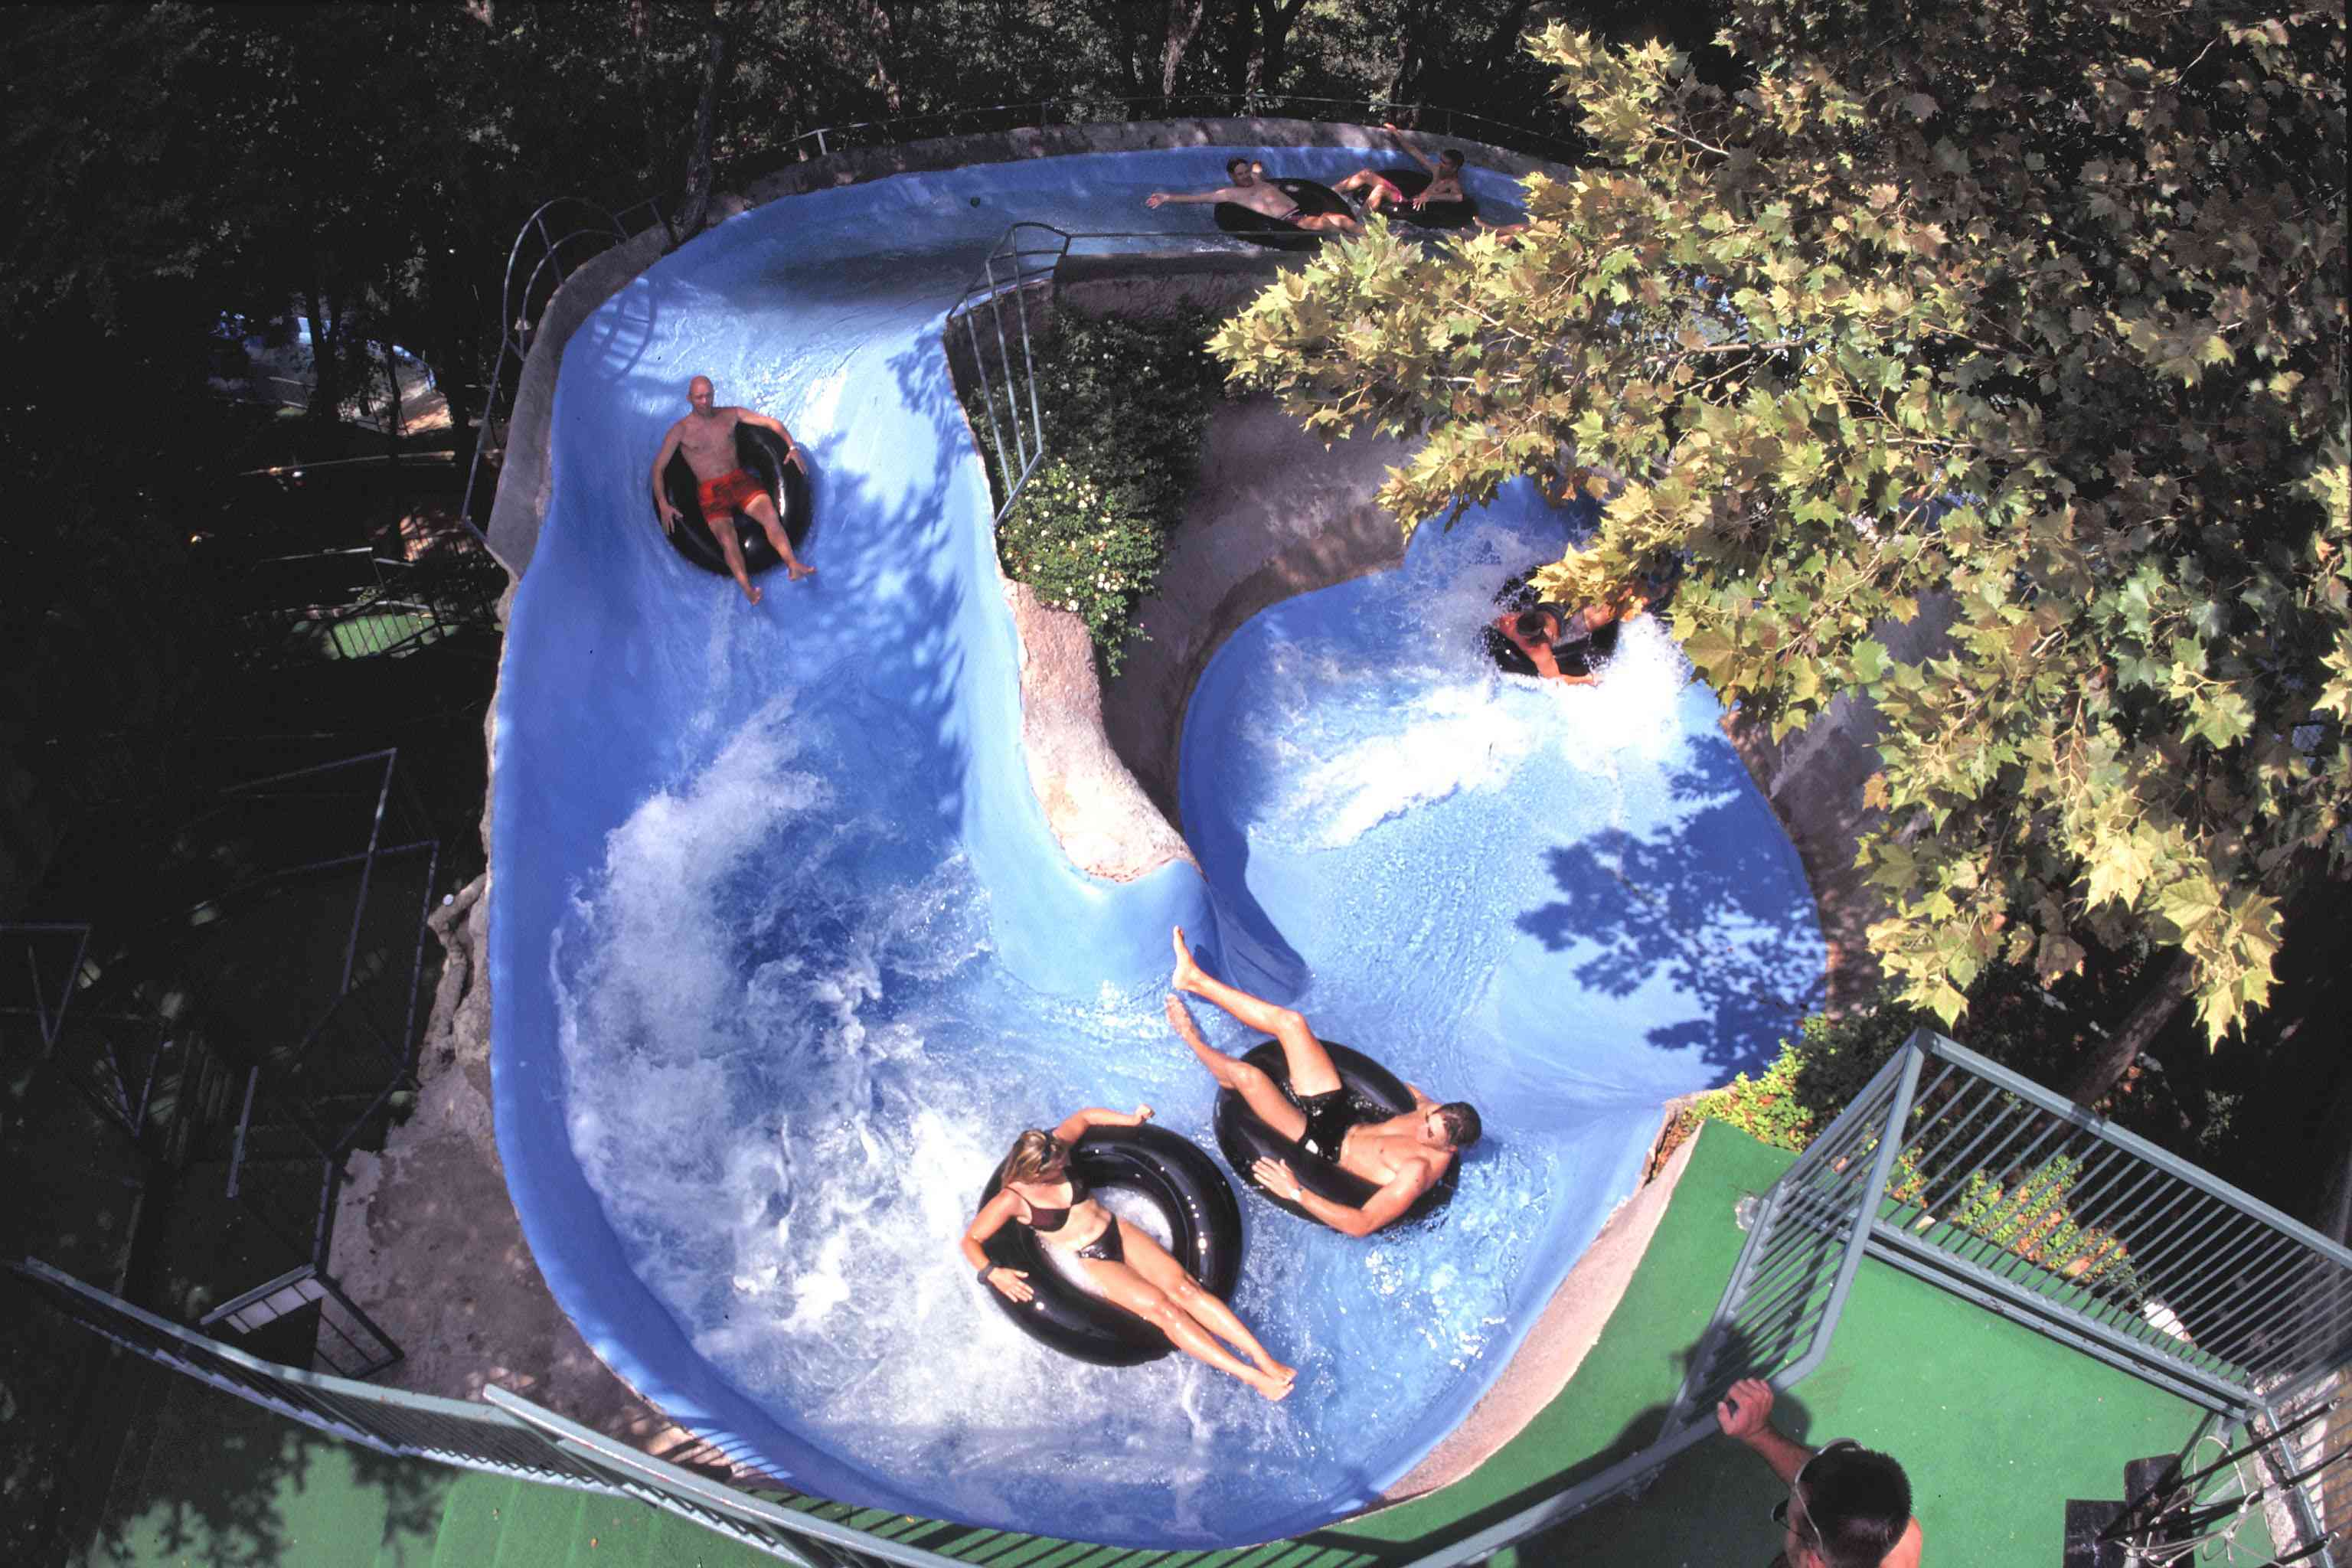 Water park guests floating down slide on tubes